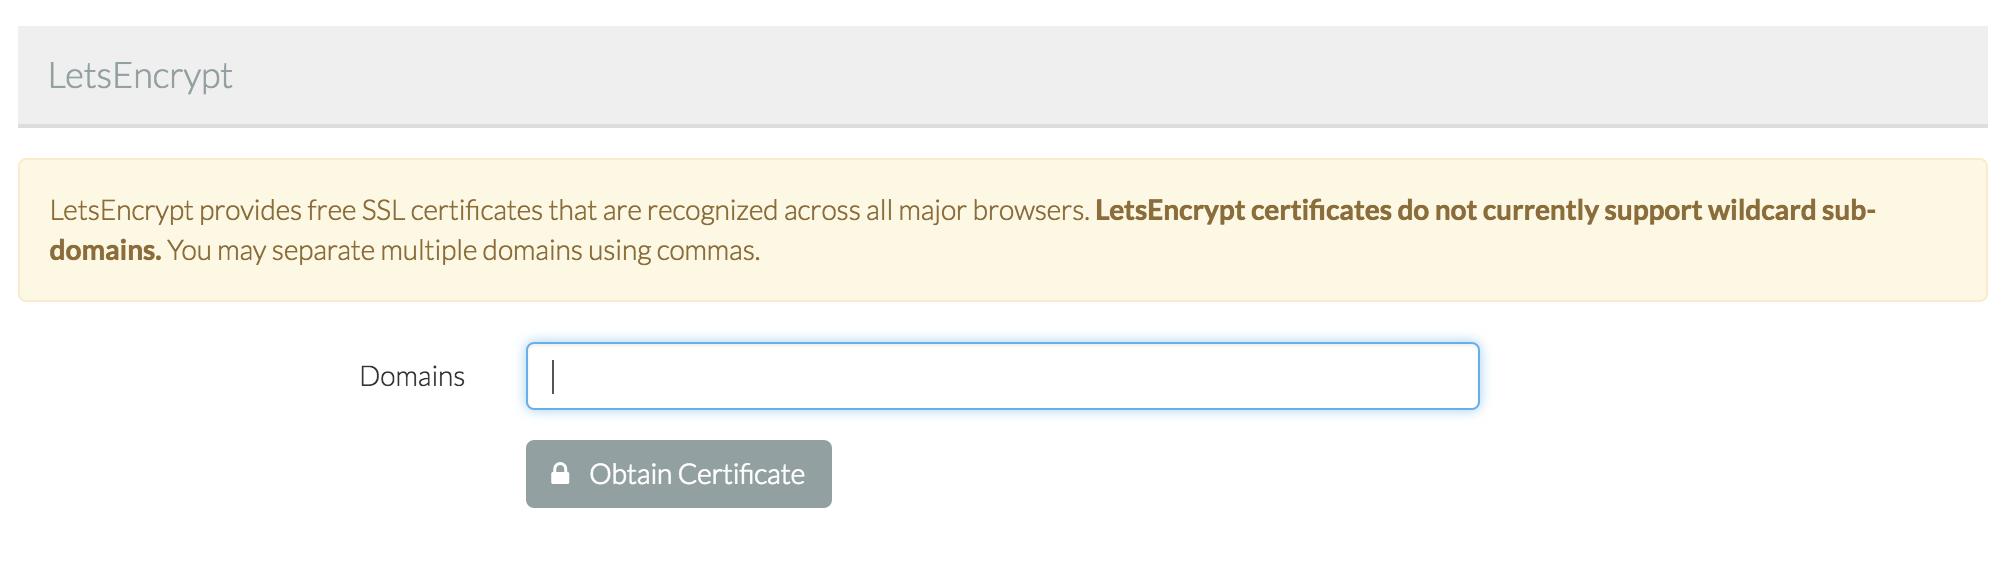 Free SSL certificate via Let's Encrypt